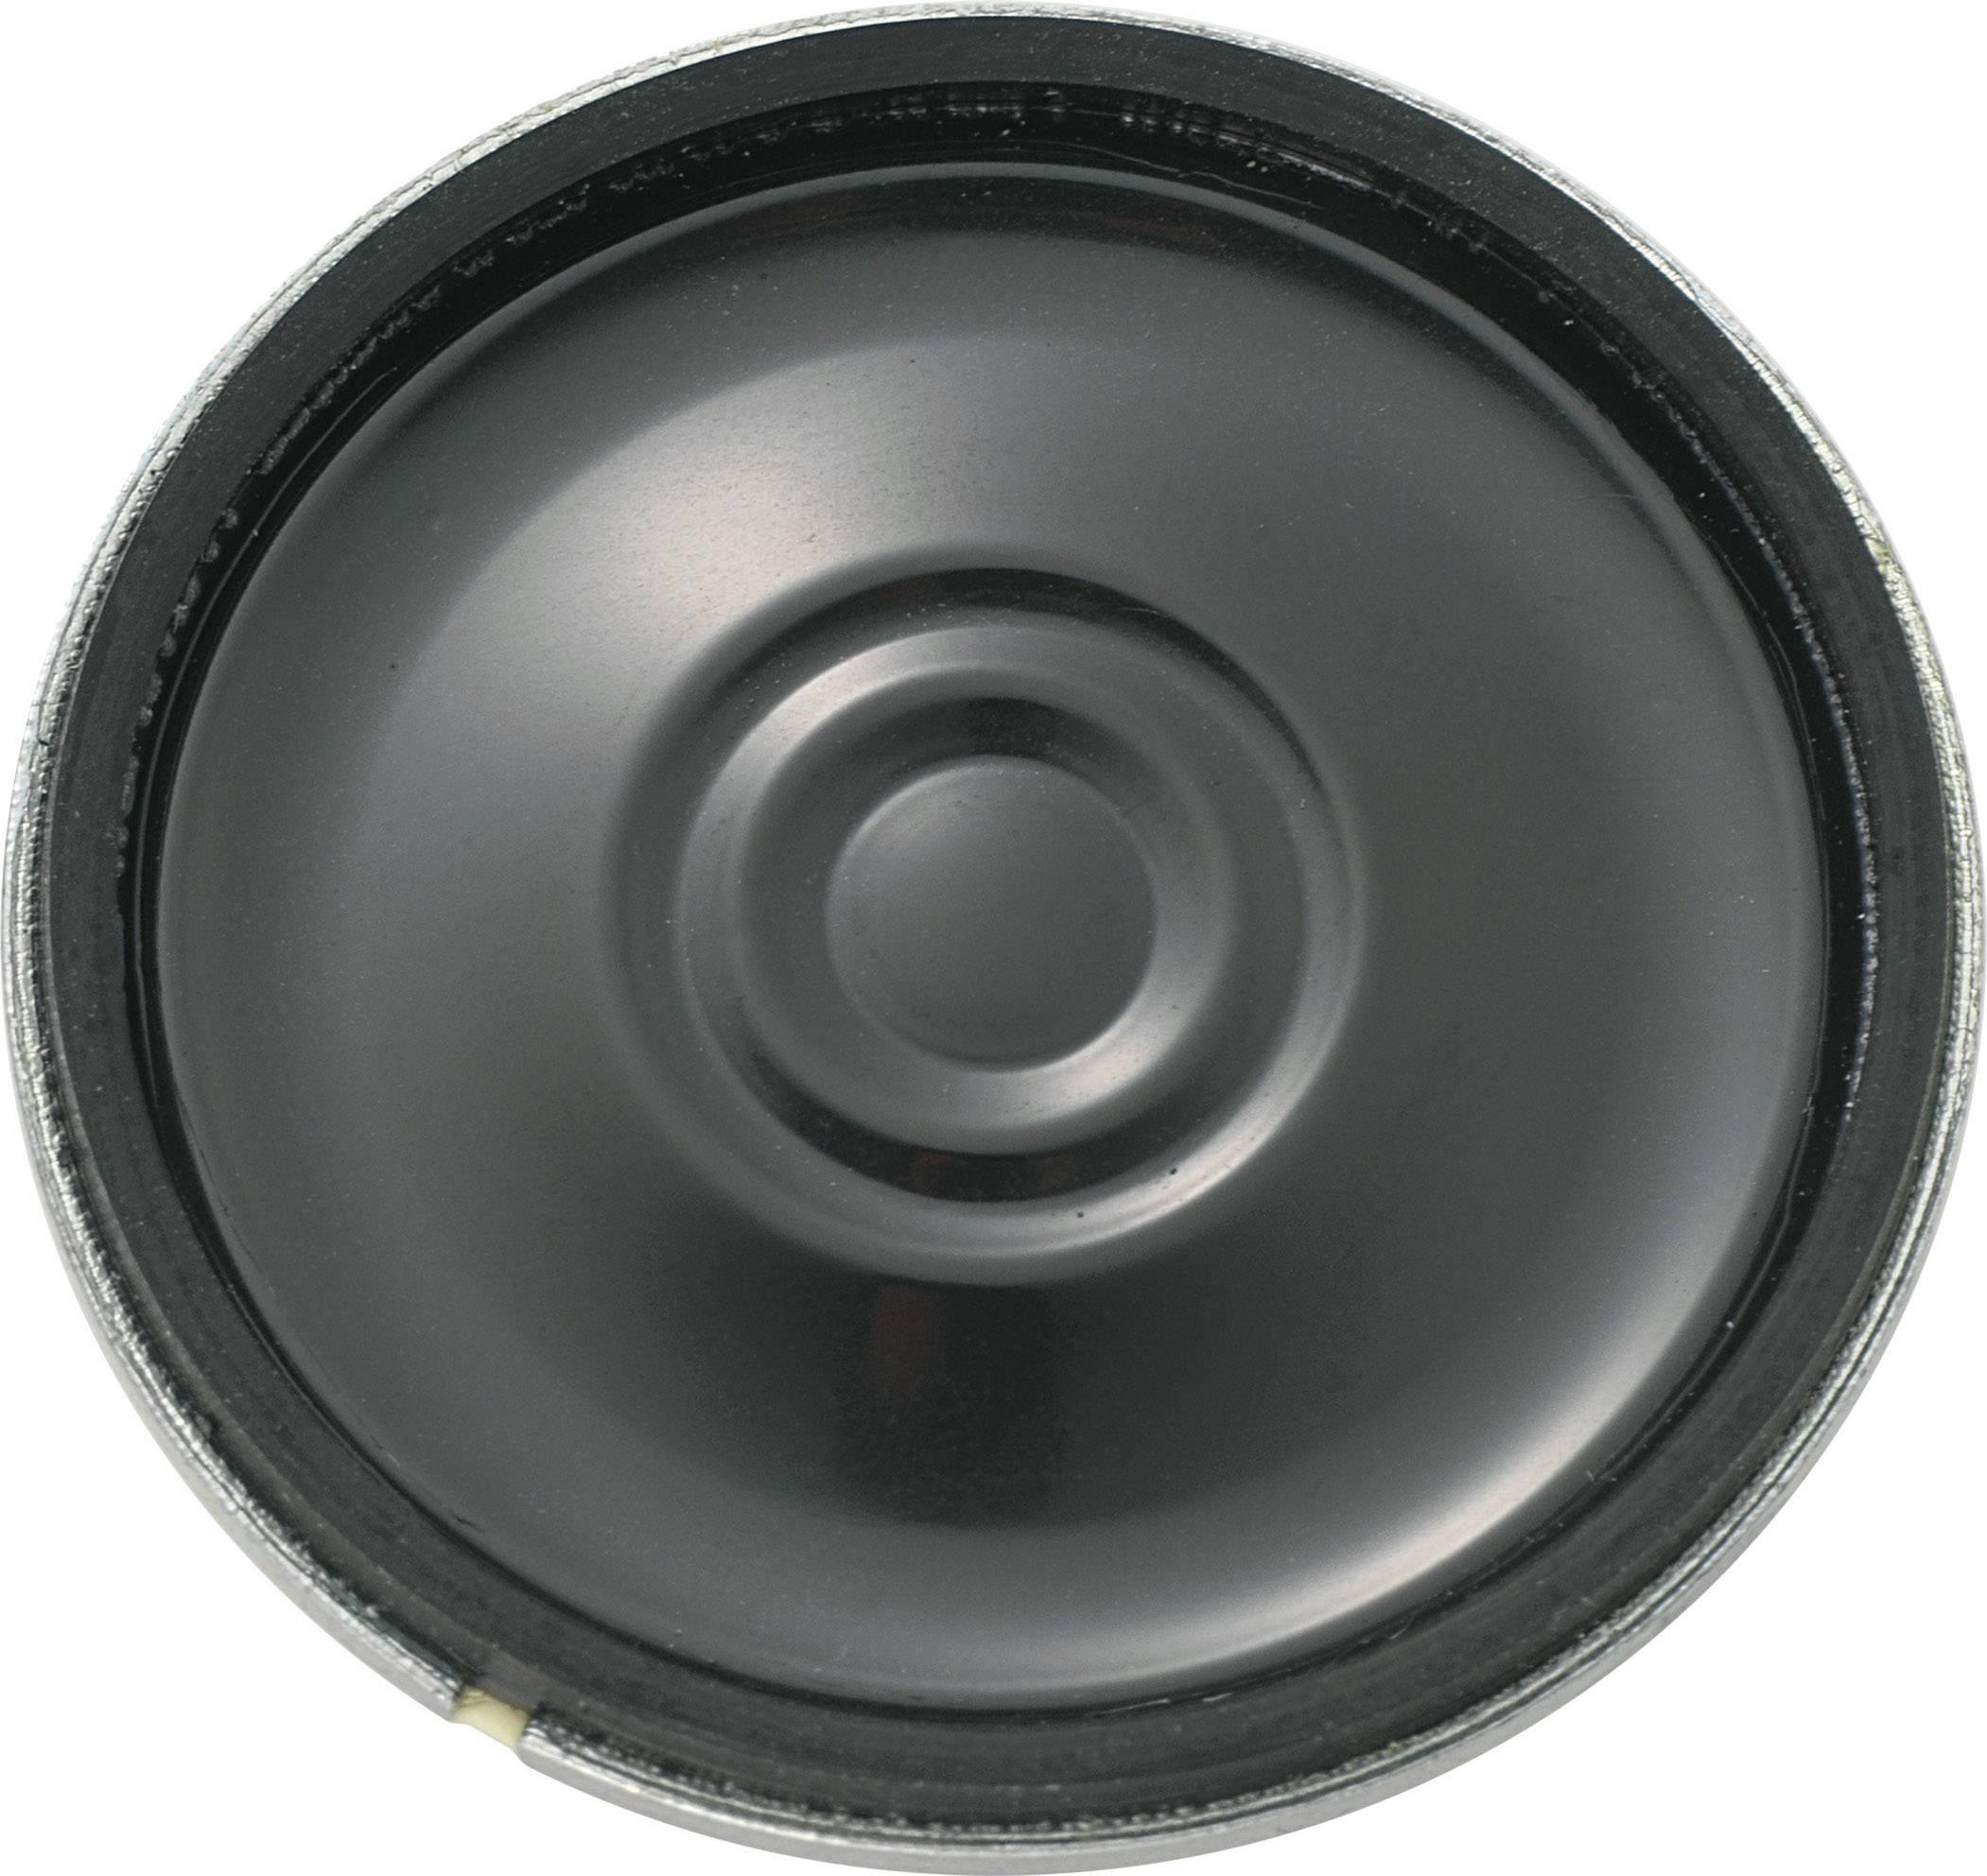 Miniaturní reproduktor série KP KEPO KP2848SP1F-5836, 92 dB , 5 mm